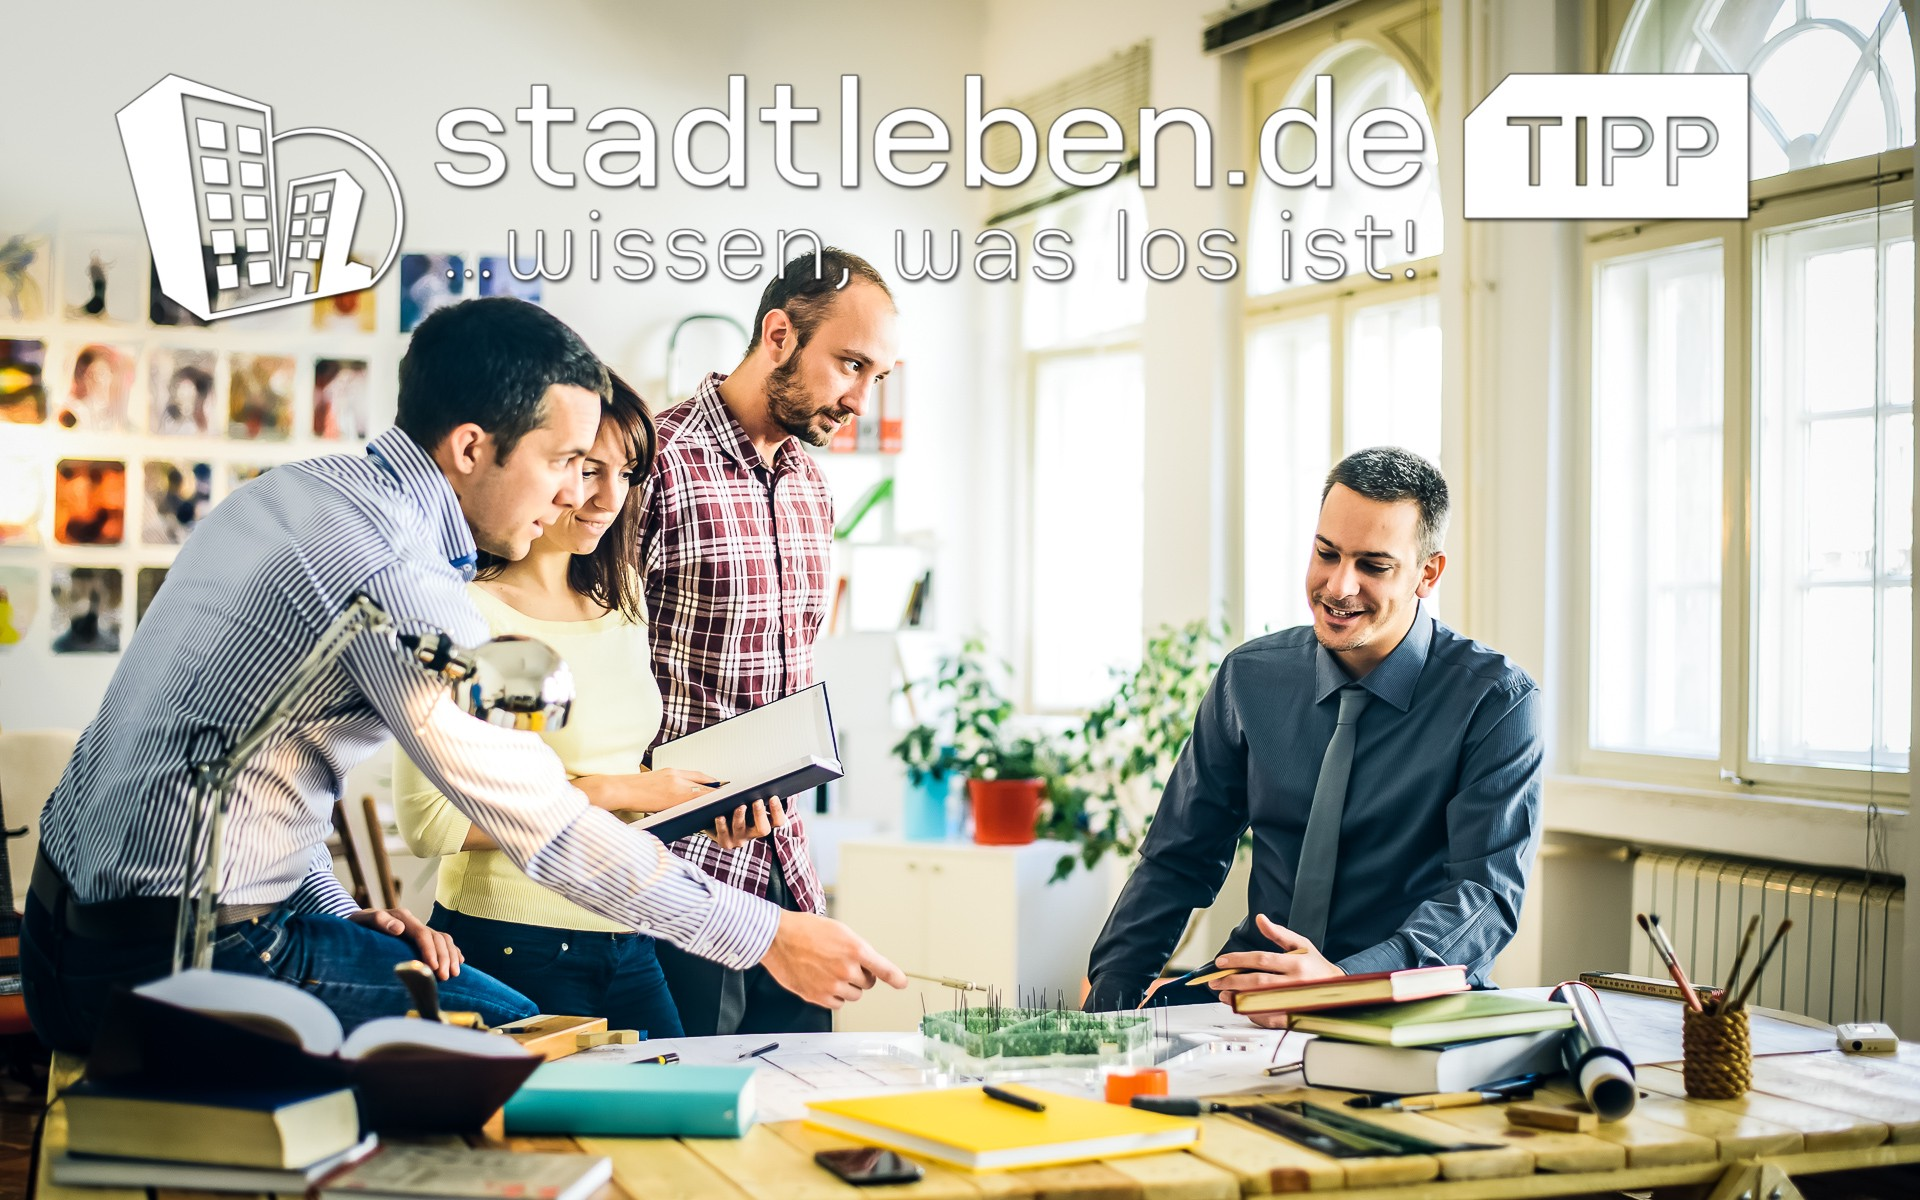 Team, Männer, Frau, Papierkram, Bücher, Arbeit